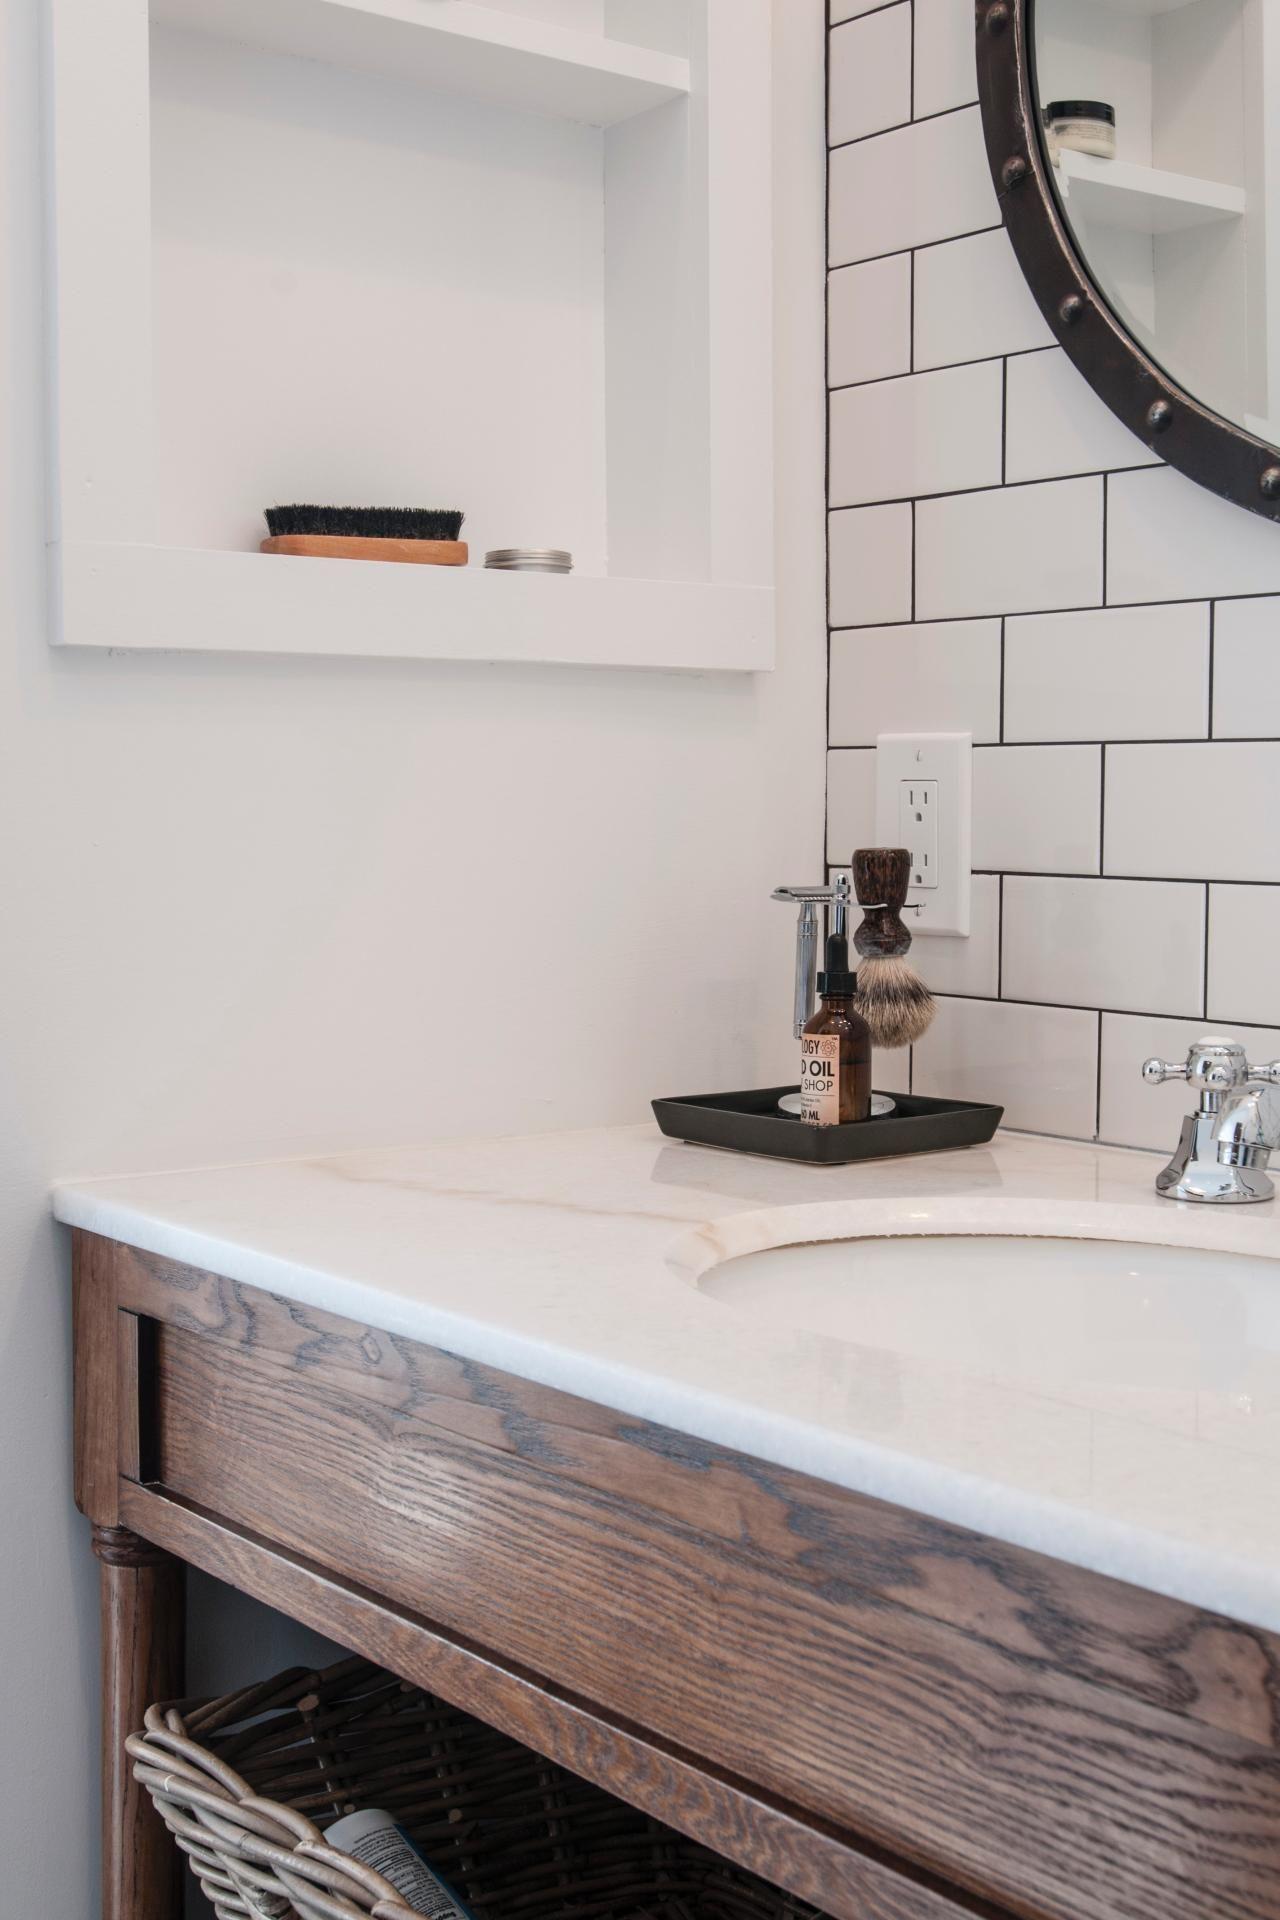 Photos Hgtv Timeless Subway Tile Bathroom Backsplash Lowes